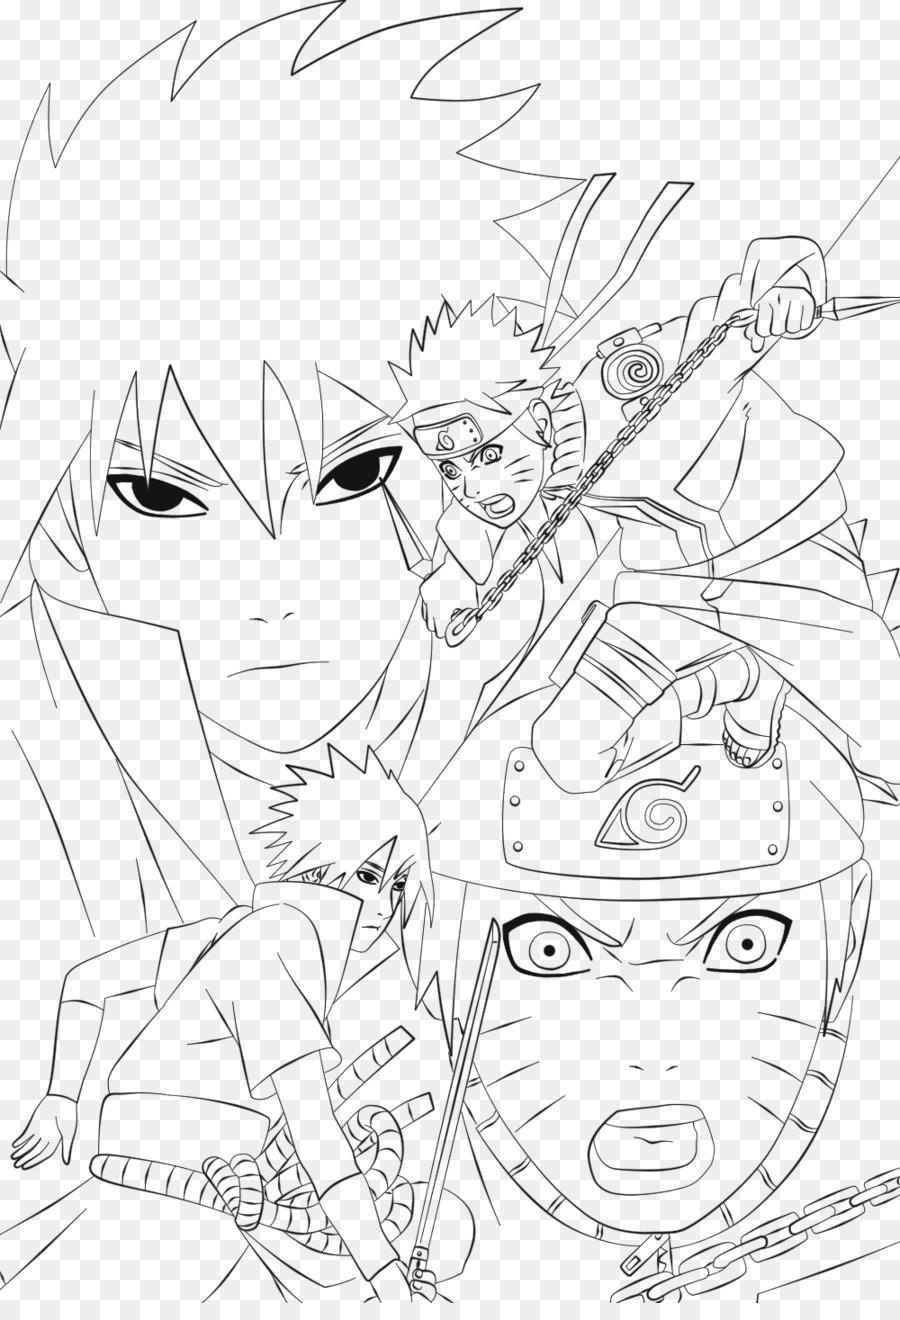 Sasuke Uchiha Art En Ligne Naruto En Noir Et Blanc De Gaara Naruto